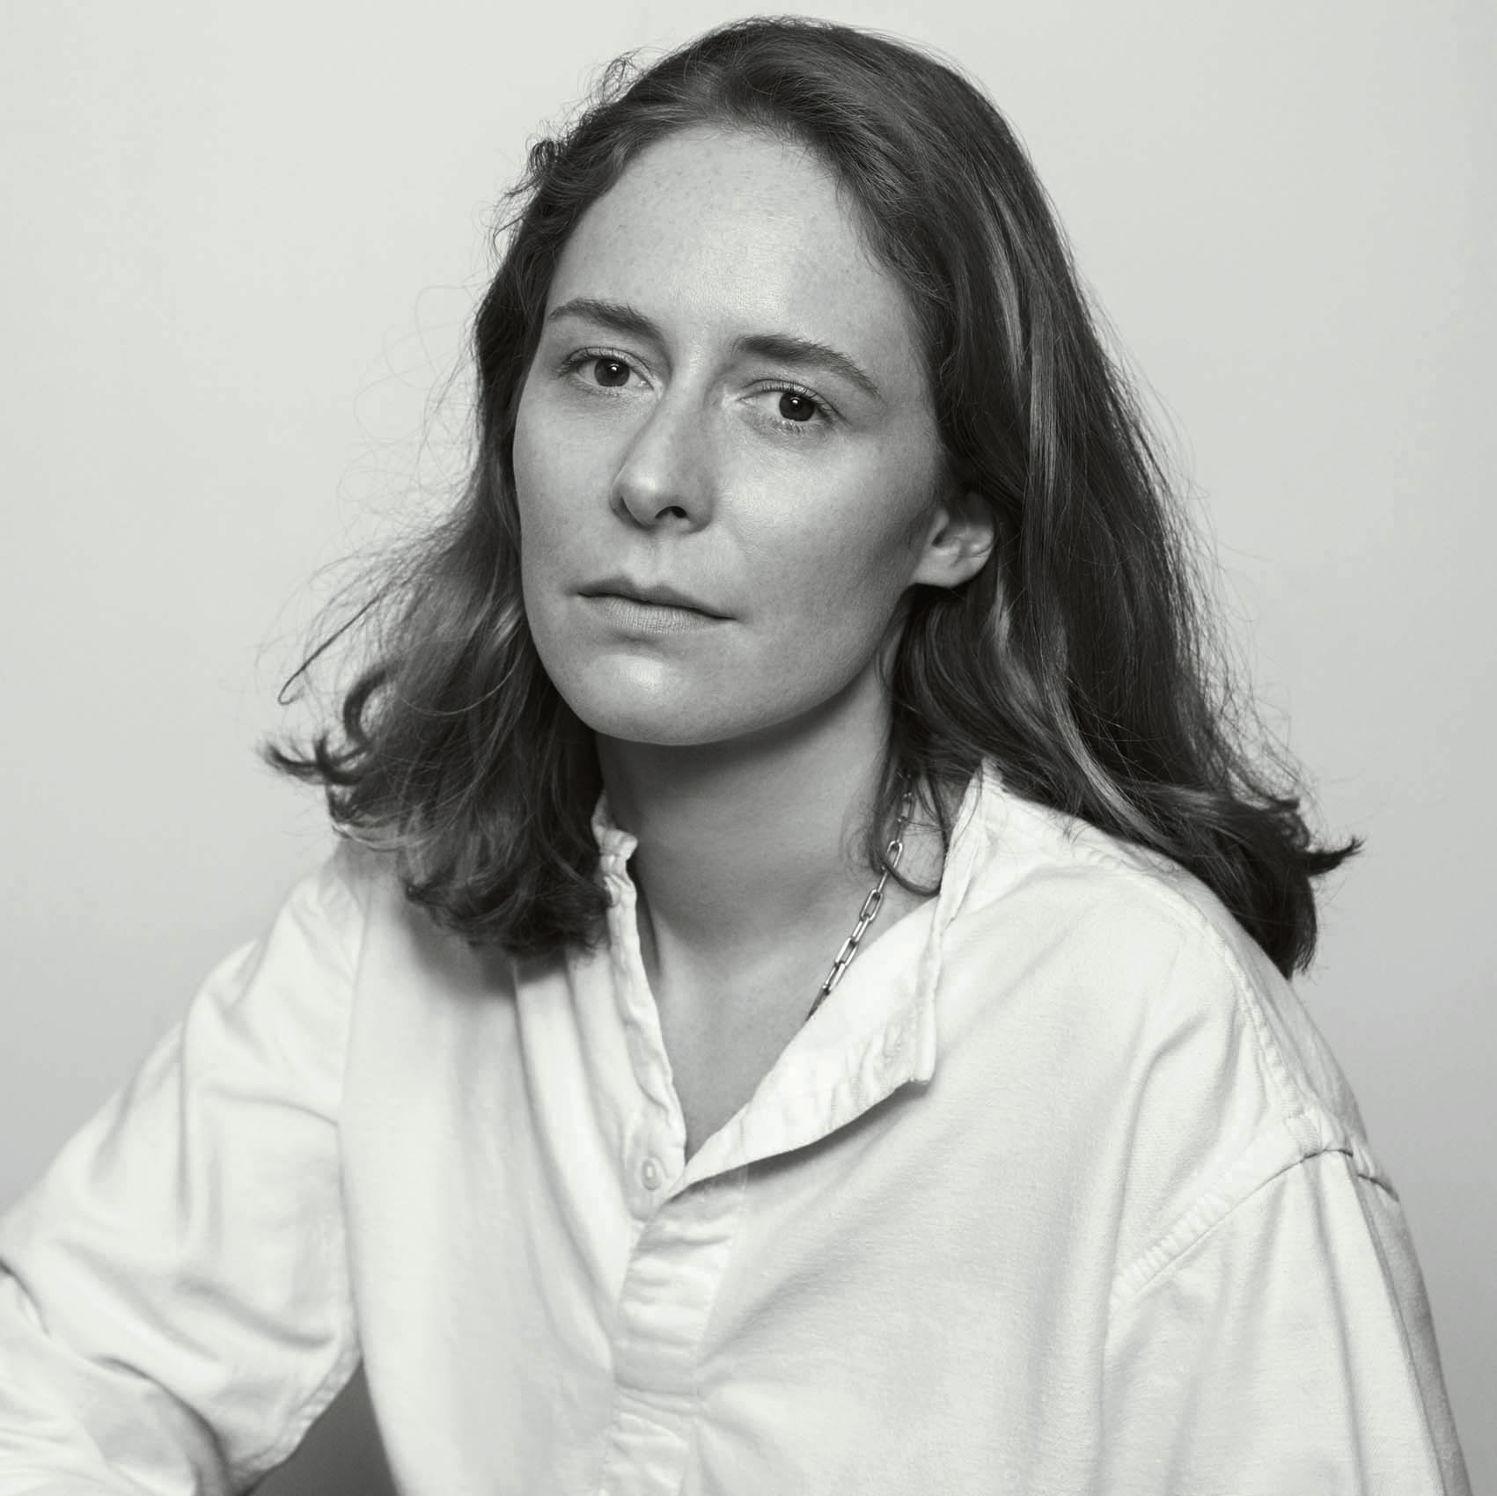 Portrait Nadège Vanhée Cybulski crédit Inez et Vinoodh